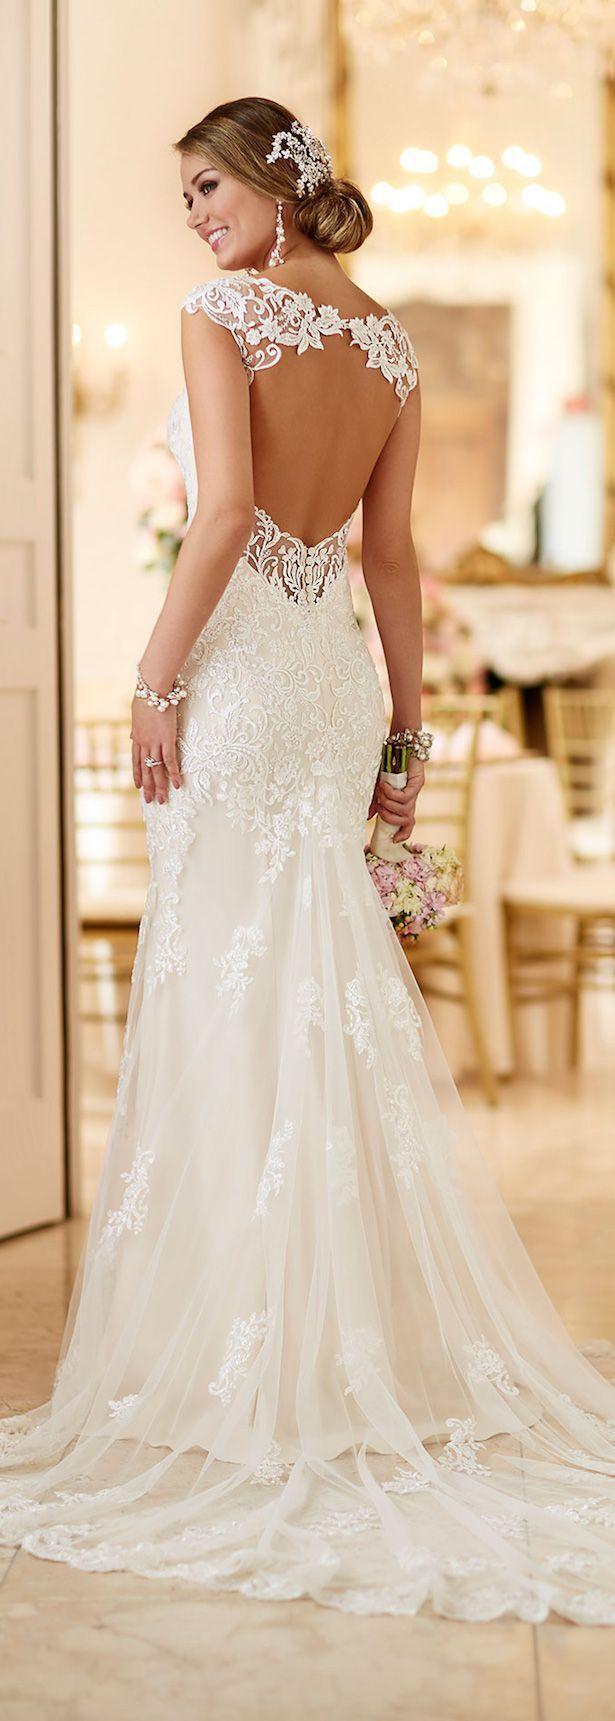 Stella york spring 2016 bridal collection lace belle for Stella york wedding dresses near me